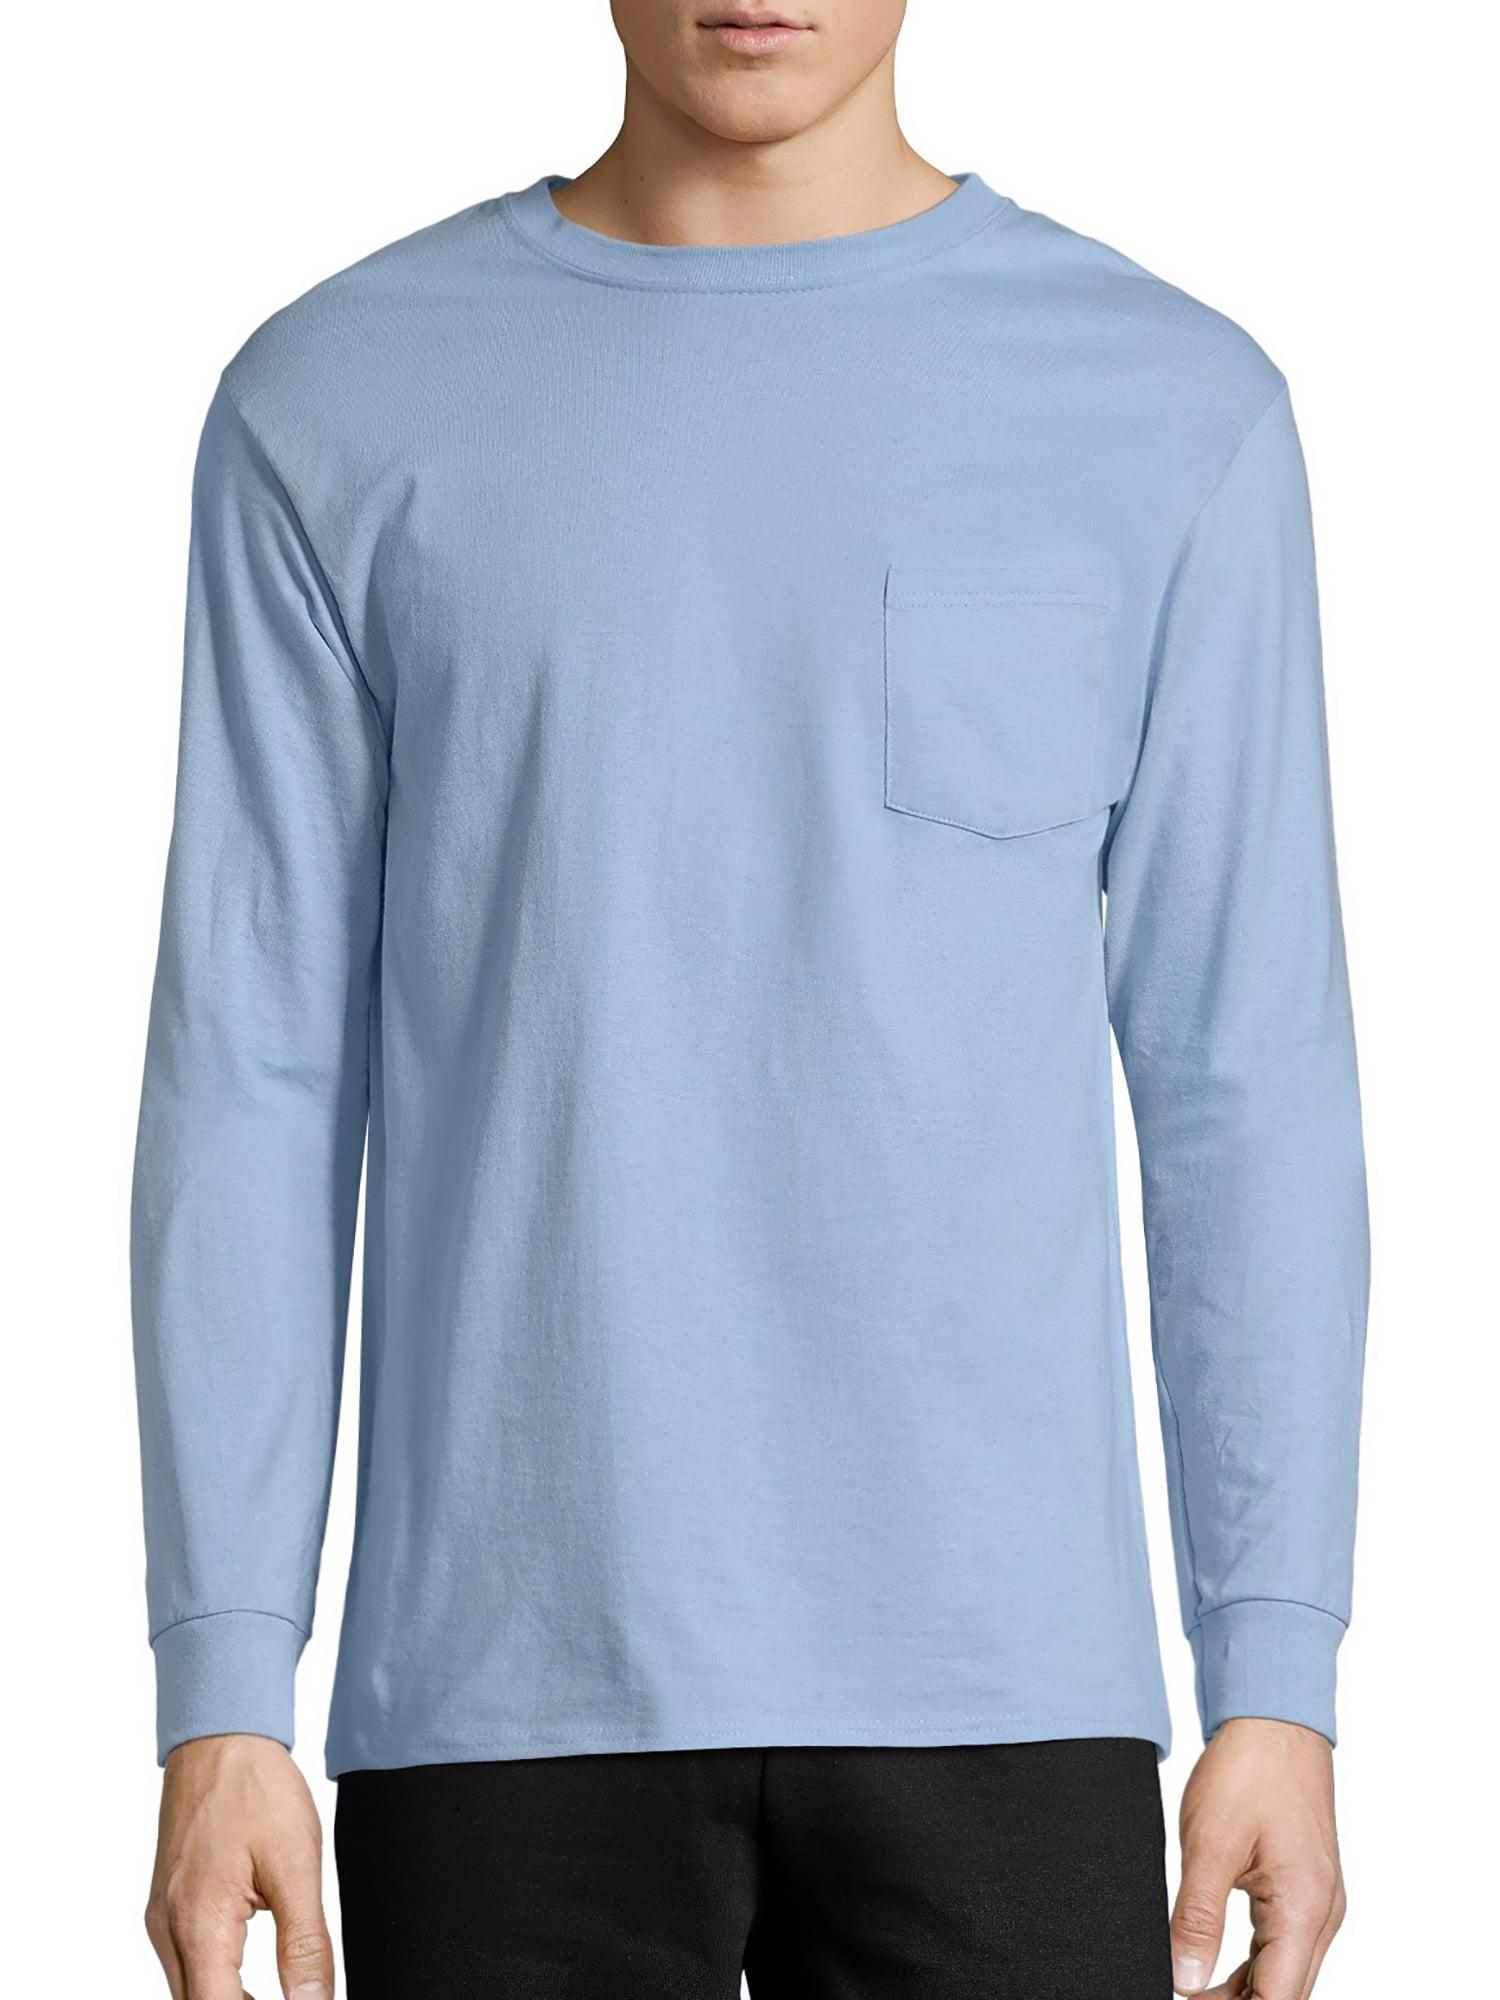 53d3345f310 Hanes - Hanes Men s Tagless Cotton Long Sleeve Pocket Tshirt - Walmart.com